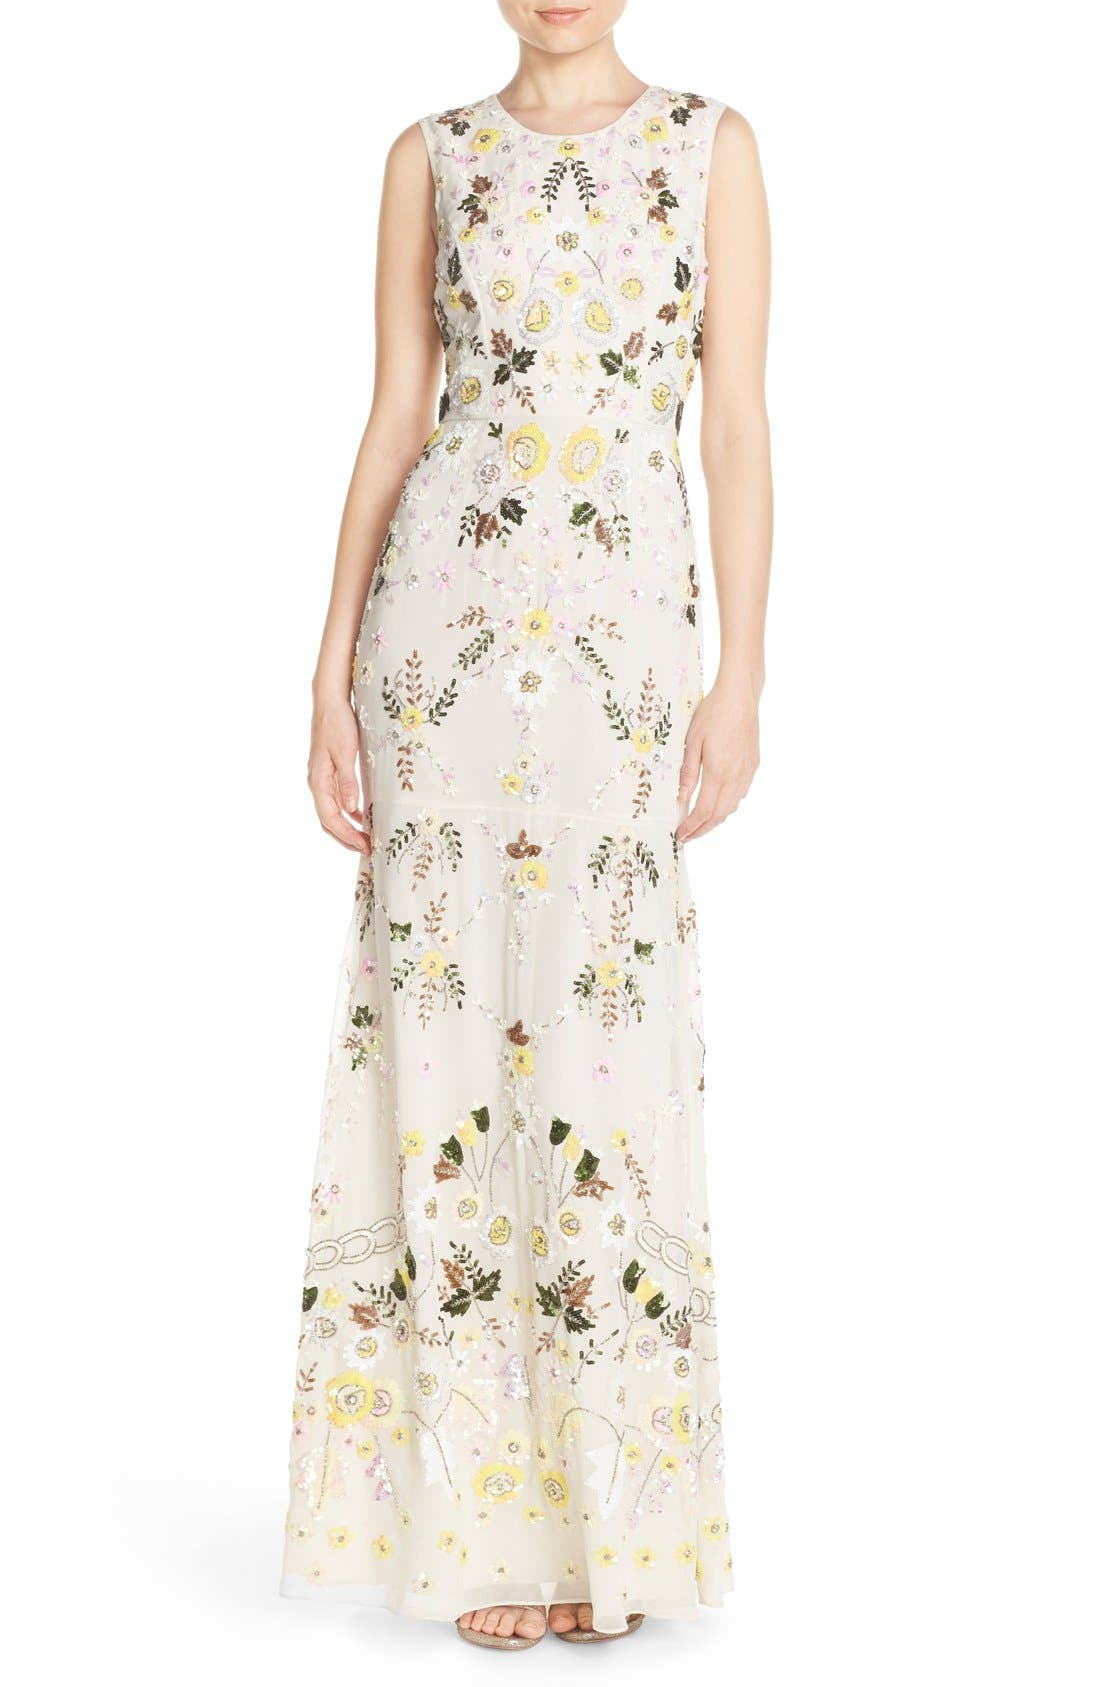 Alternate Image 1 Selected - Needle & Thread 'Sunflower' Embellished Chiffon Mermaid Gown